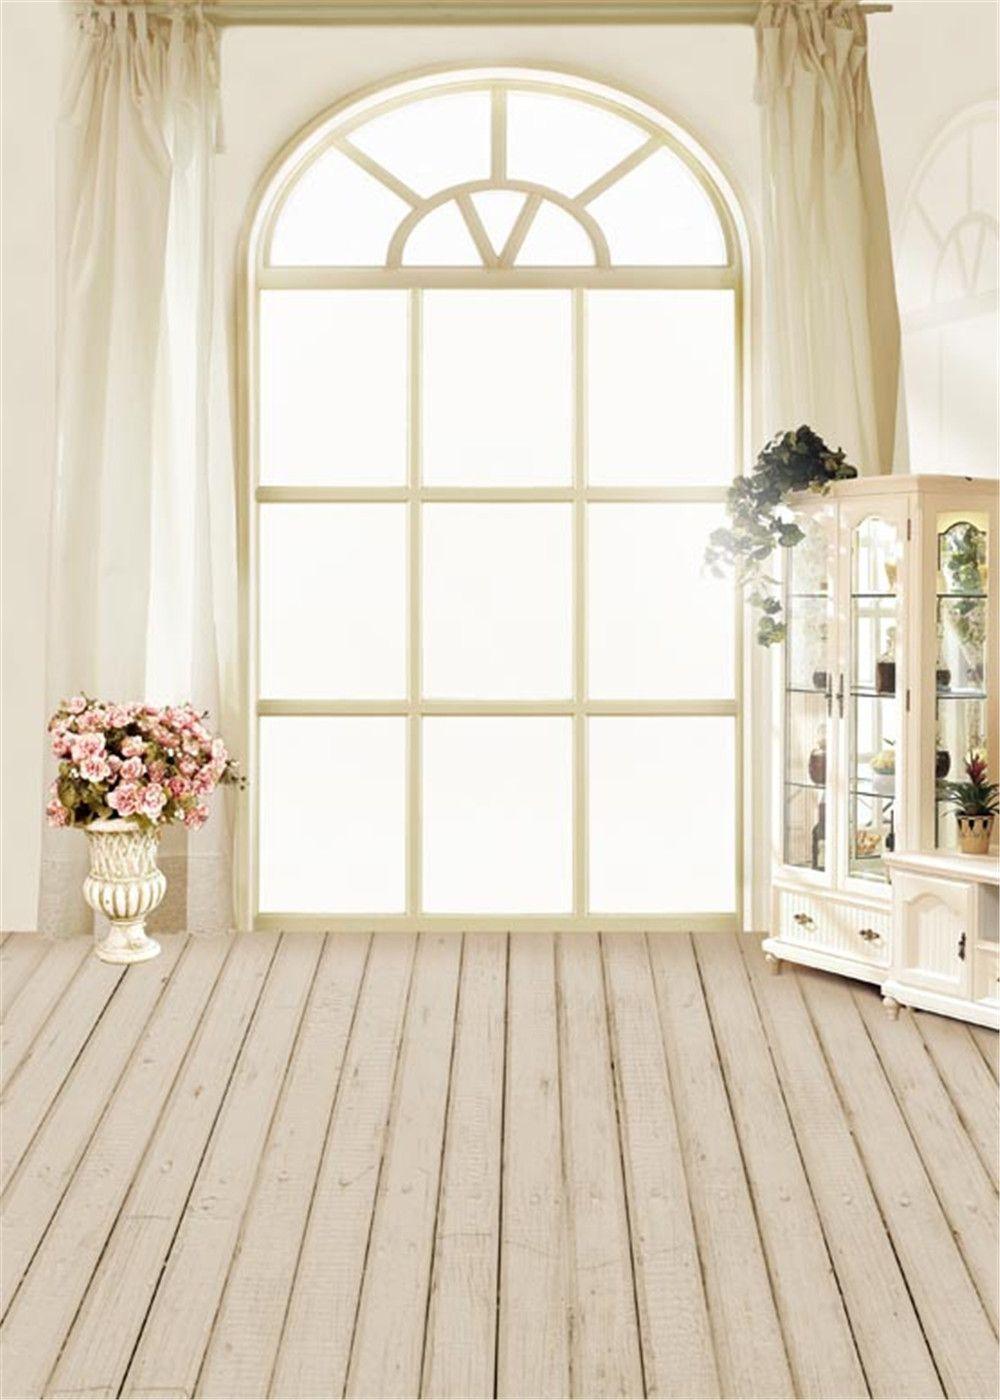 2019 Bright Window Soft Curtain Indoor Room Photo Backdrop Flowers Vases Cabinet Baby Newborn